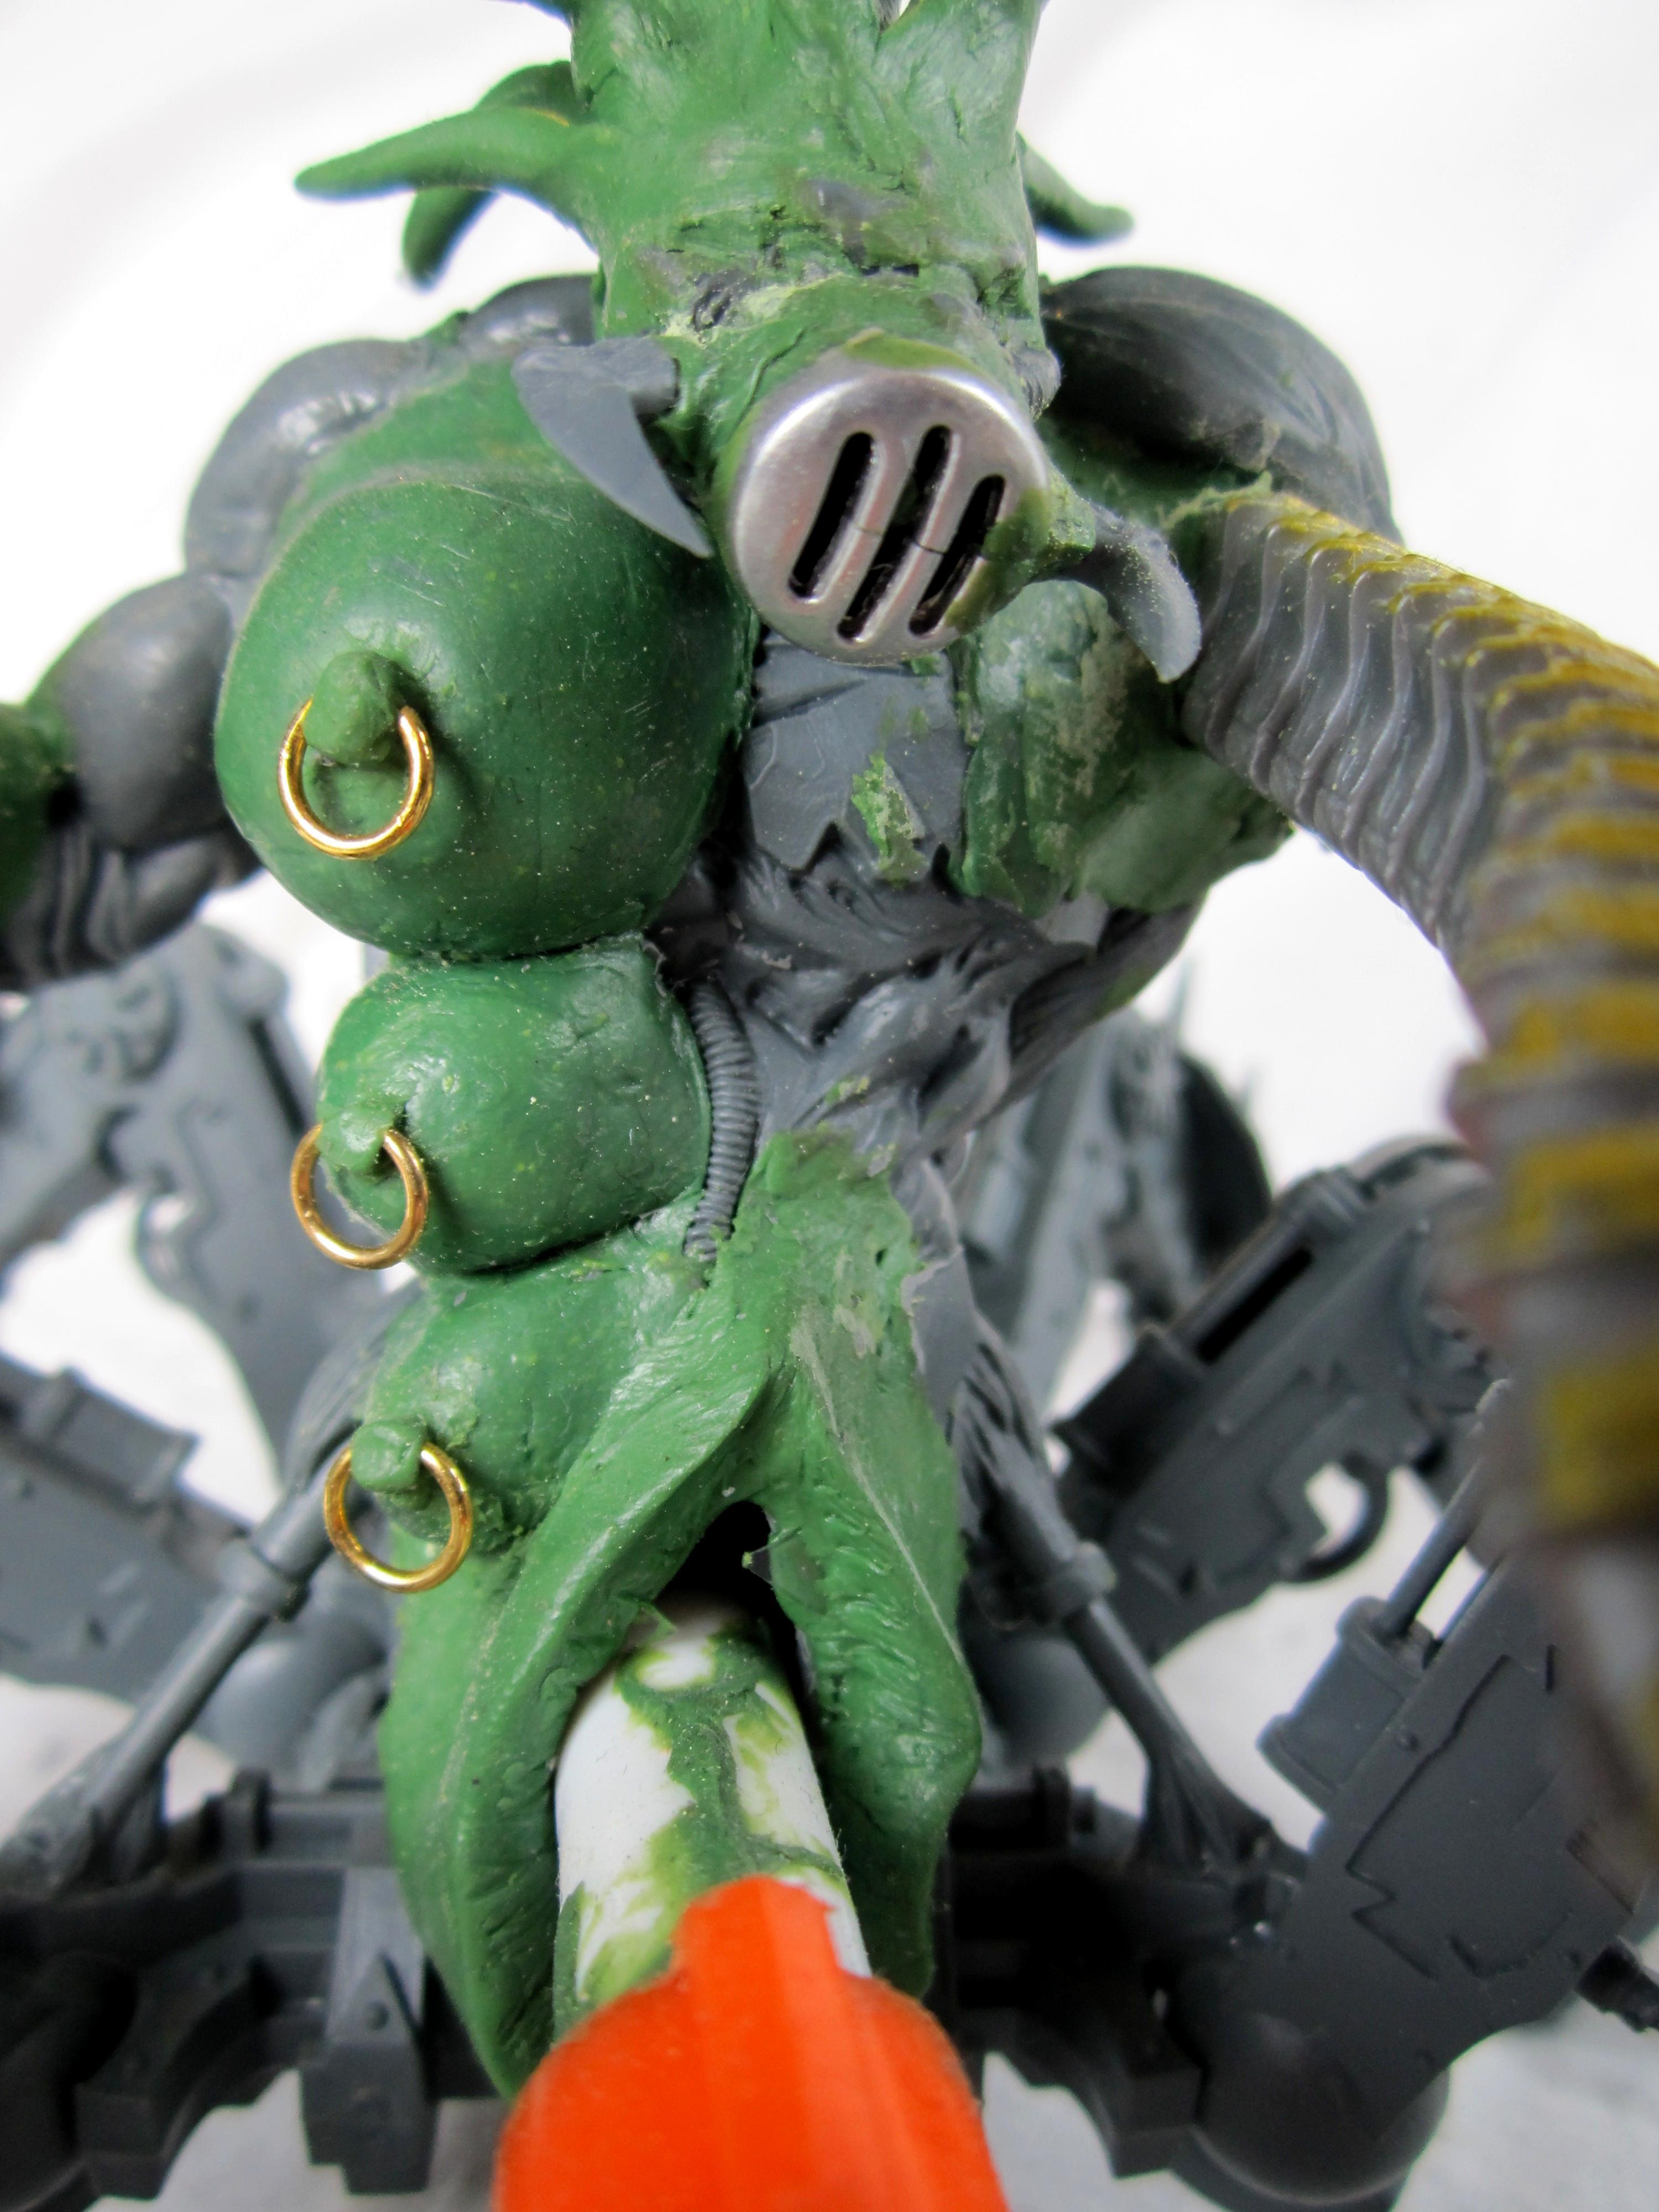 Chaos Daemons, Conversion, Greenstuff, Slaanesh, Solugrinder, Warhammer 40,000